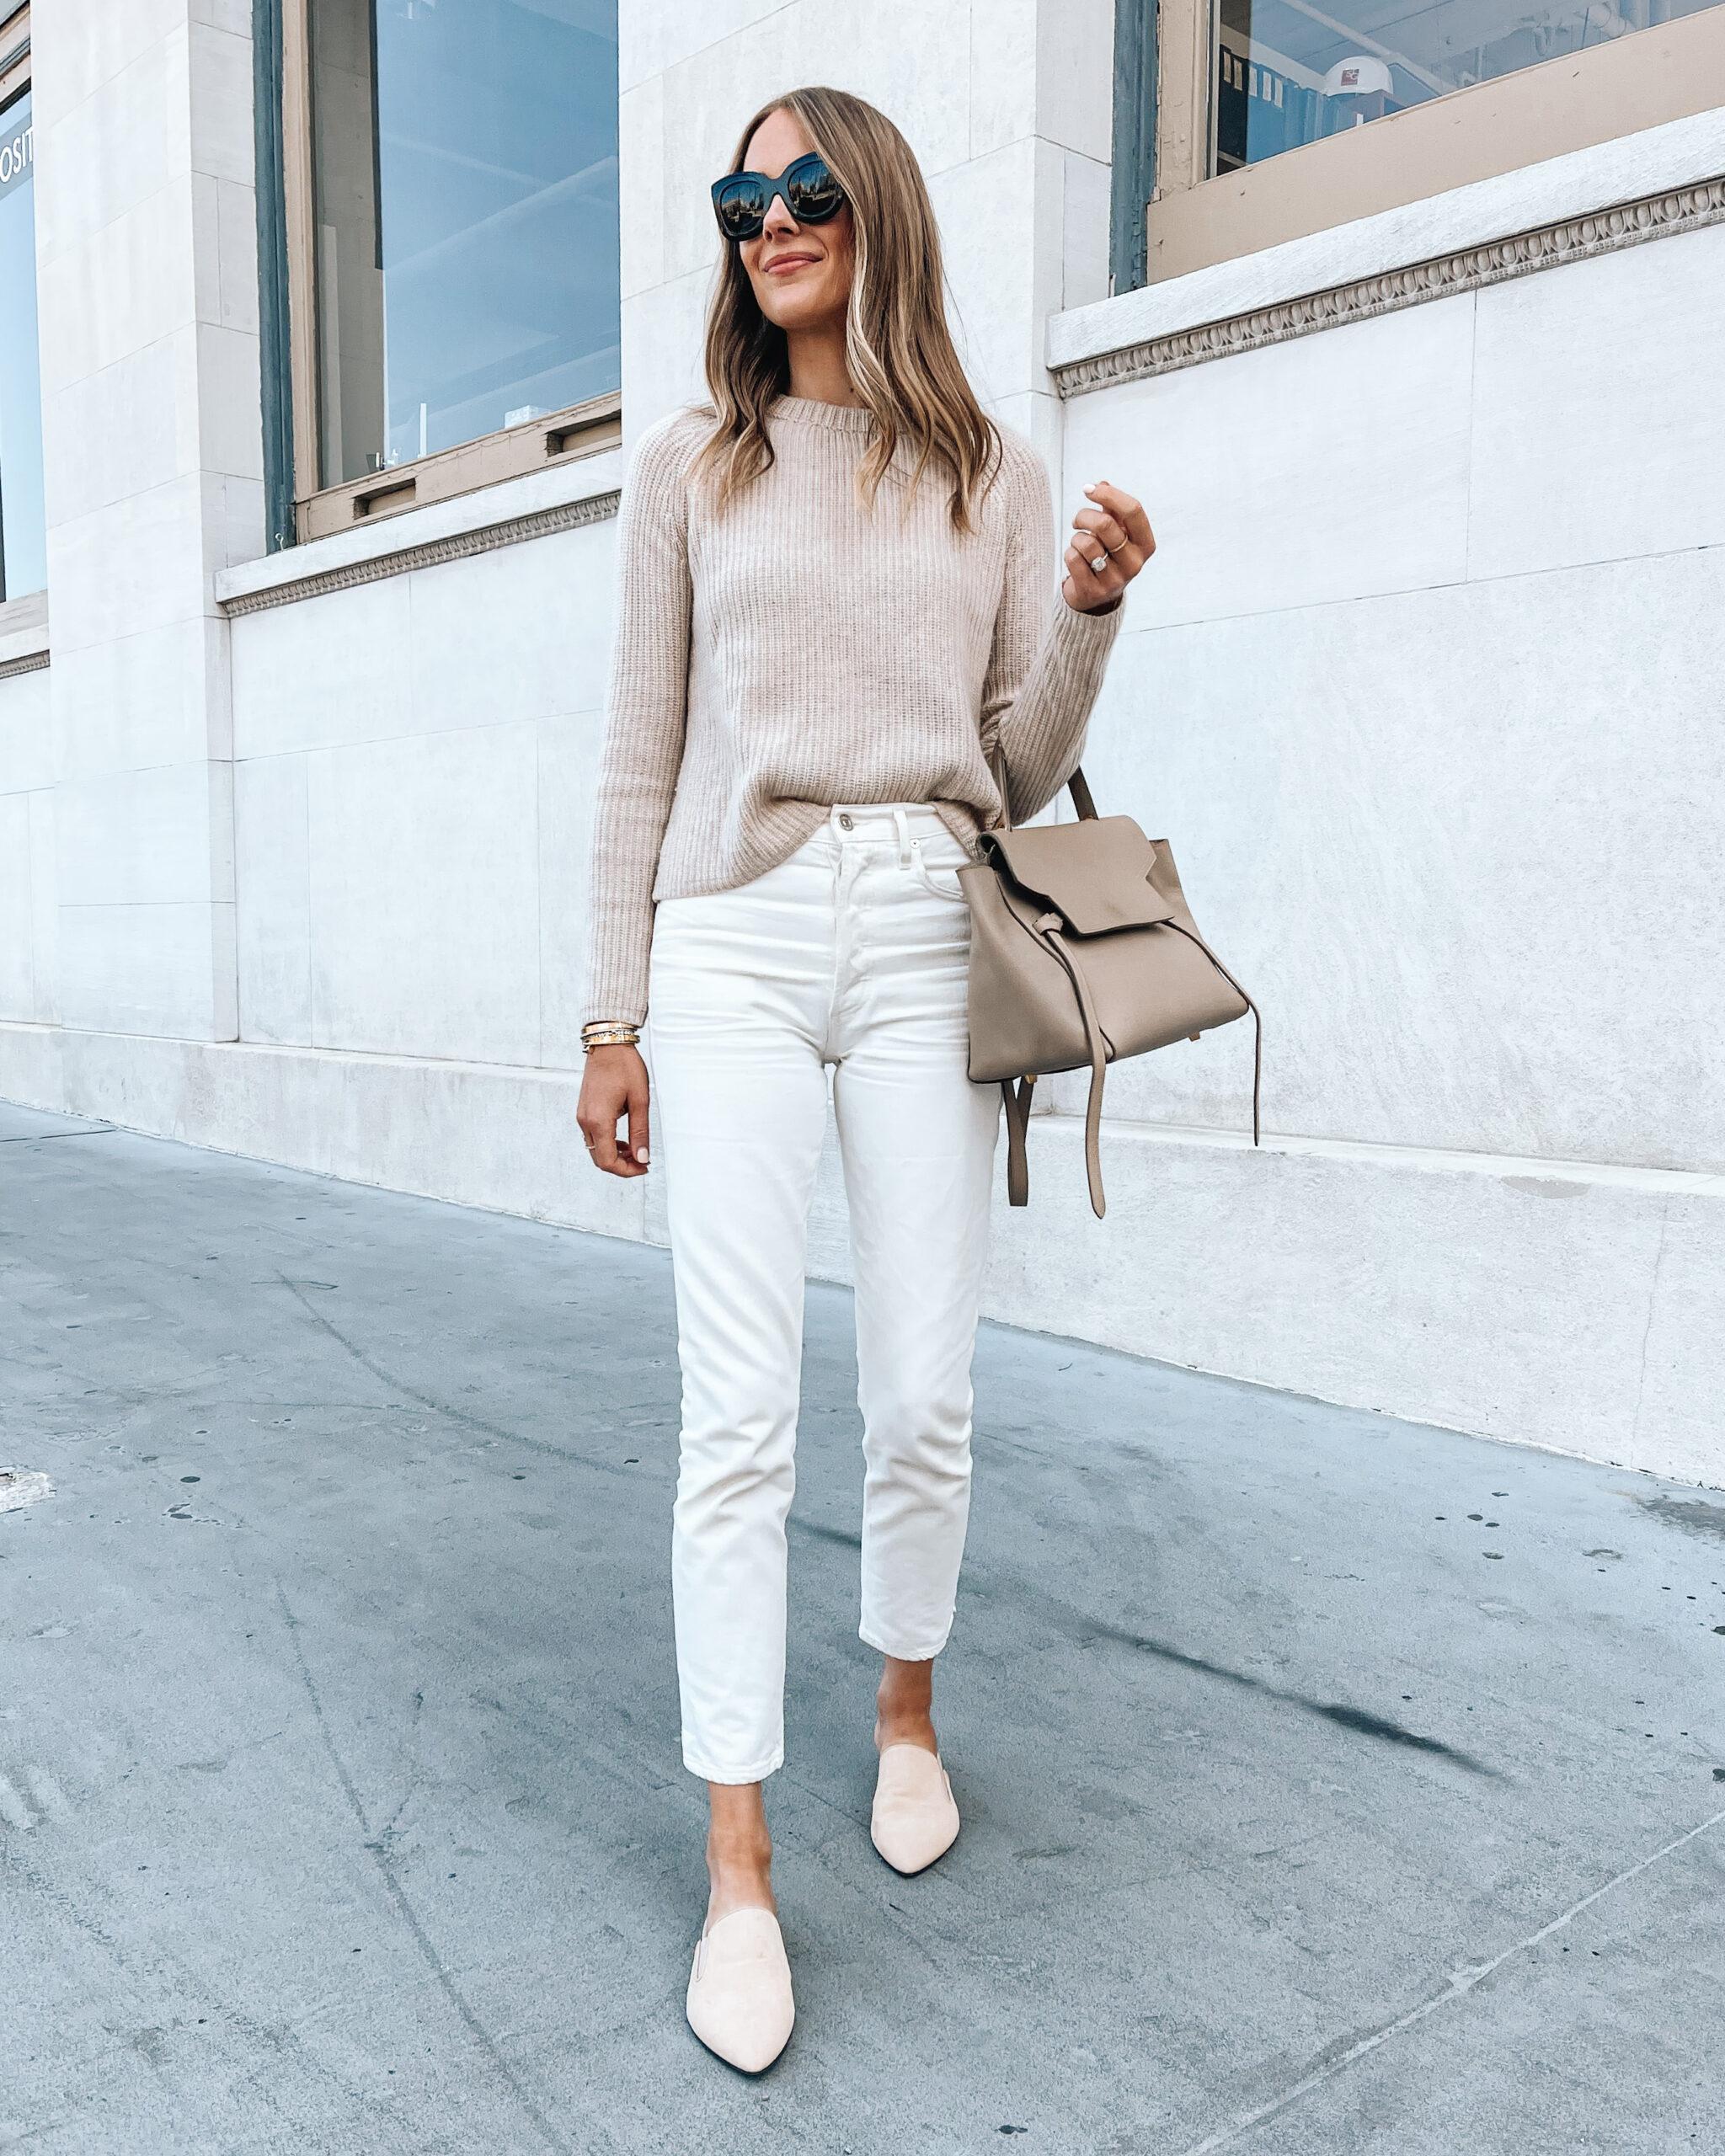 Fashion Jackson Wearing Jenni Kayne Beige Sweater White Jeans Beige Mules